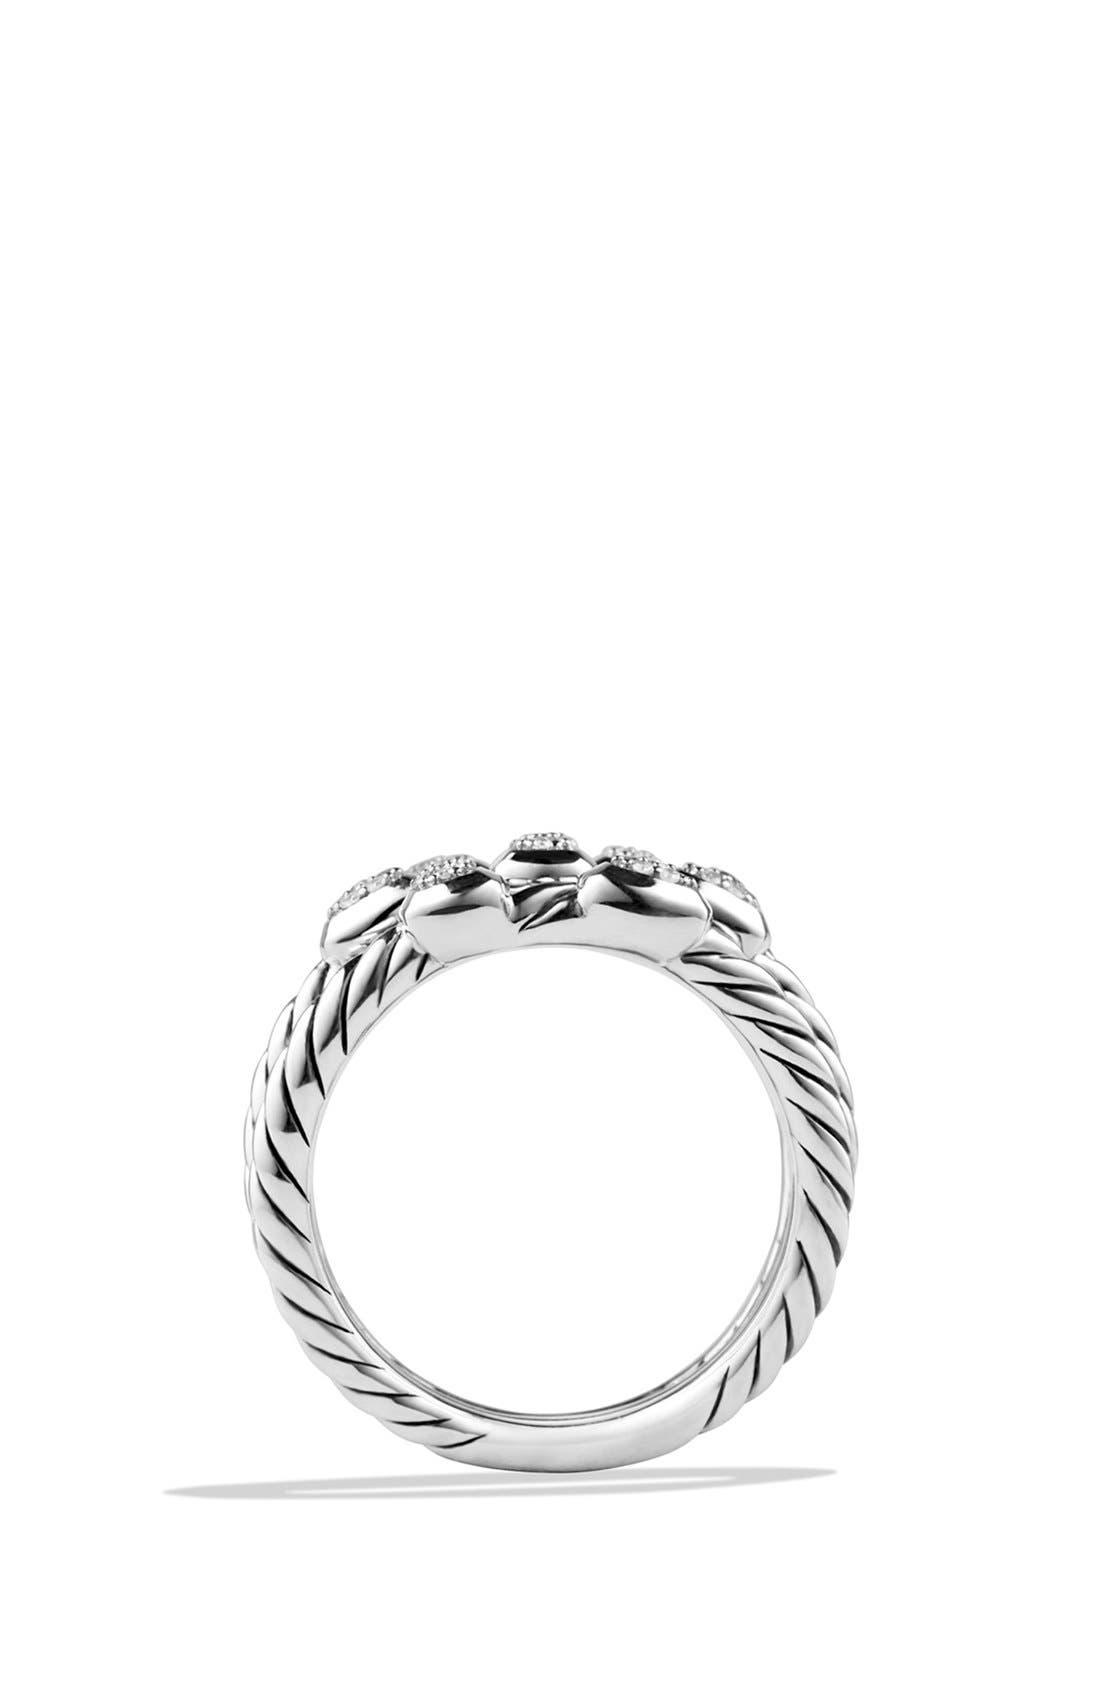 'Confetti' Ring with Diamonds,                             Alternate thumbnail 3, color,                             DIAMOND